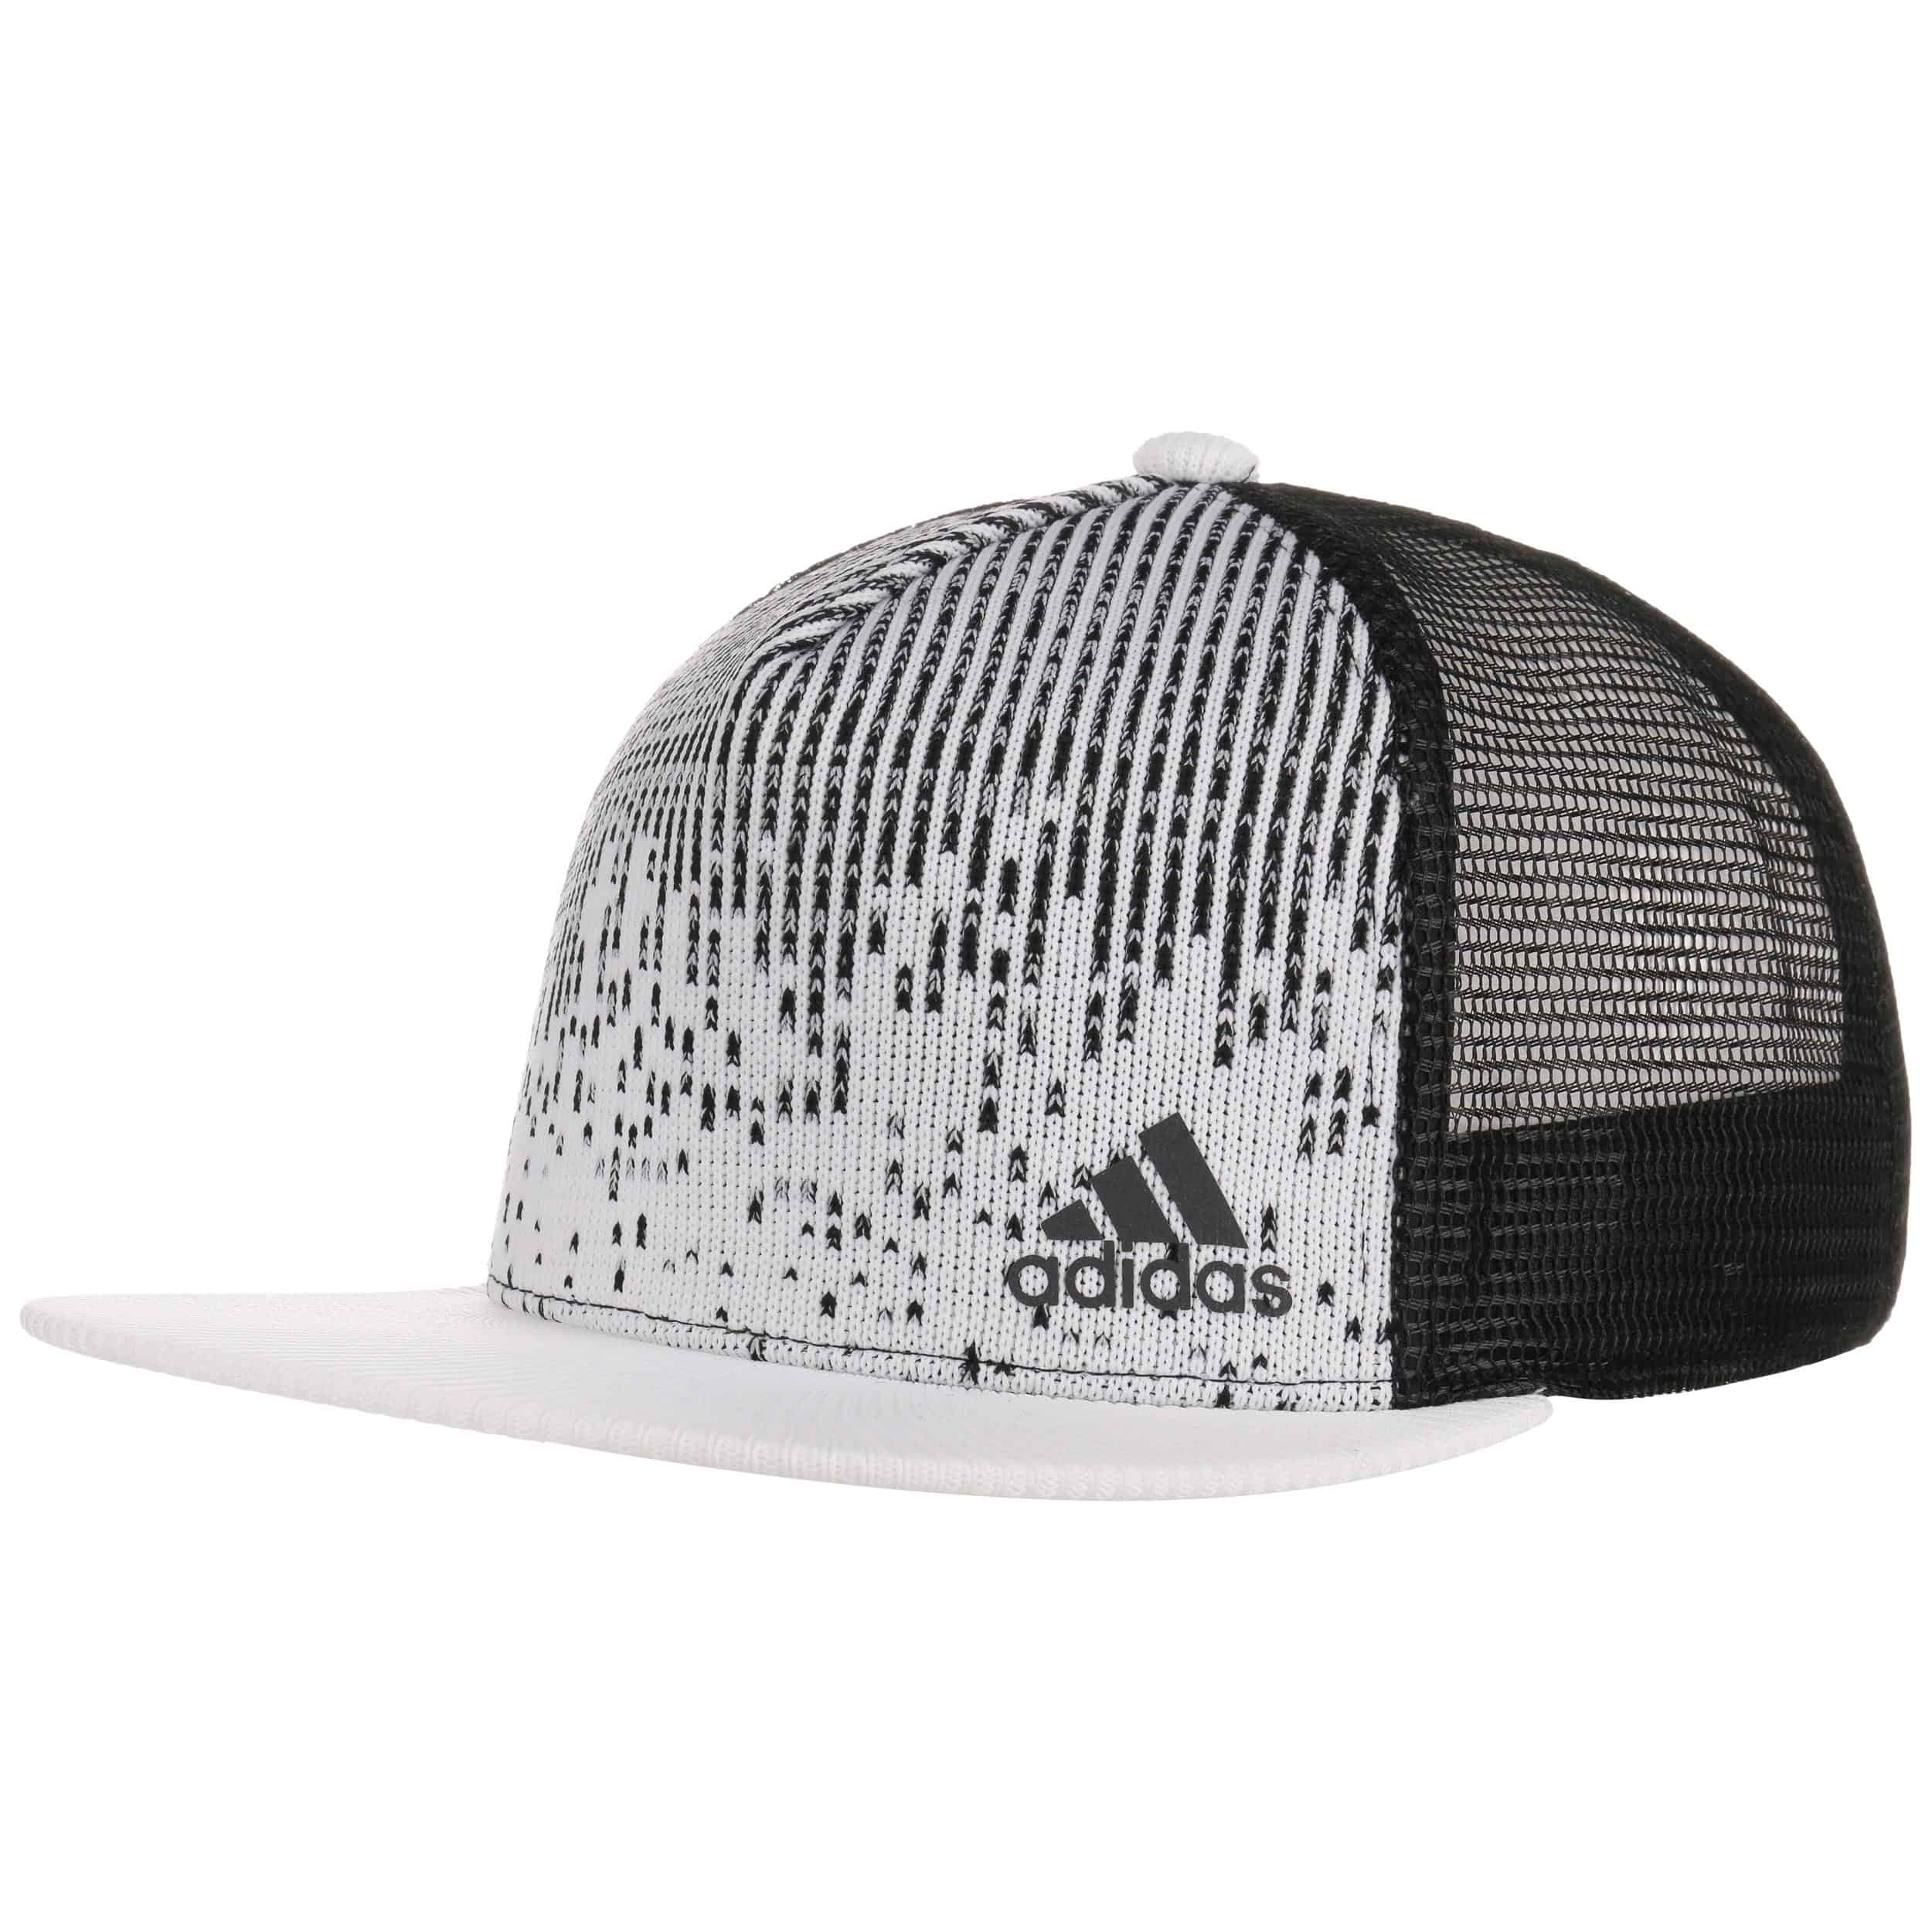 adidas cappello cappello da baseball passamontagna.